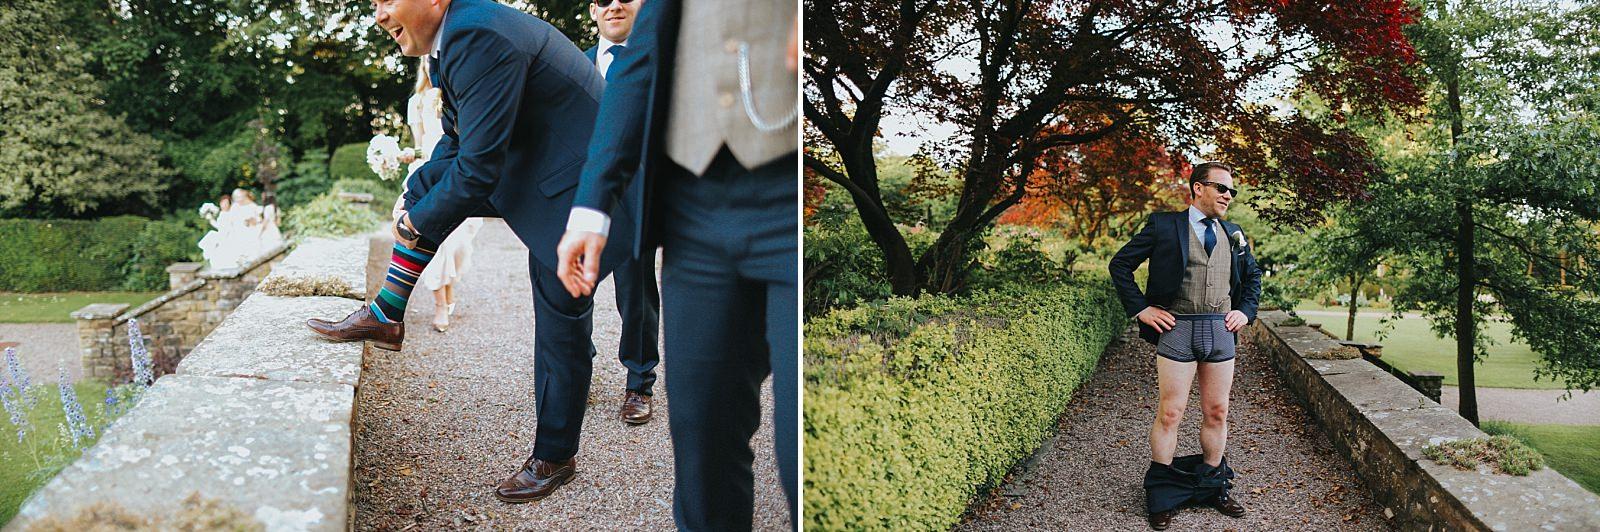 wild groomsmen